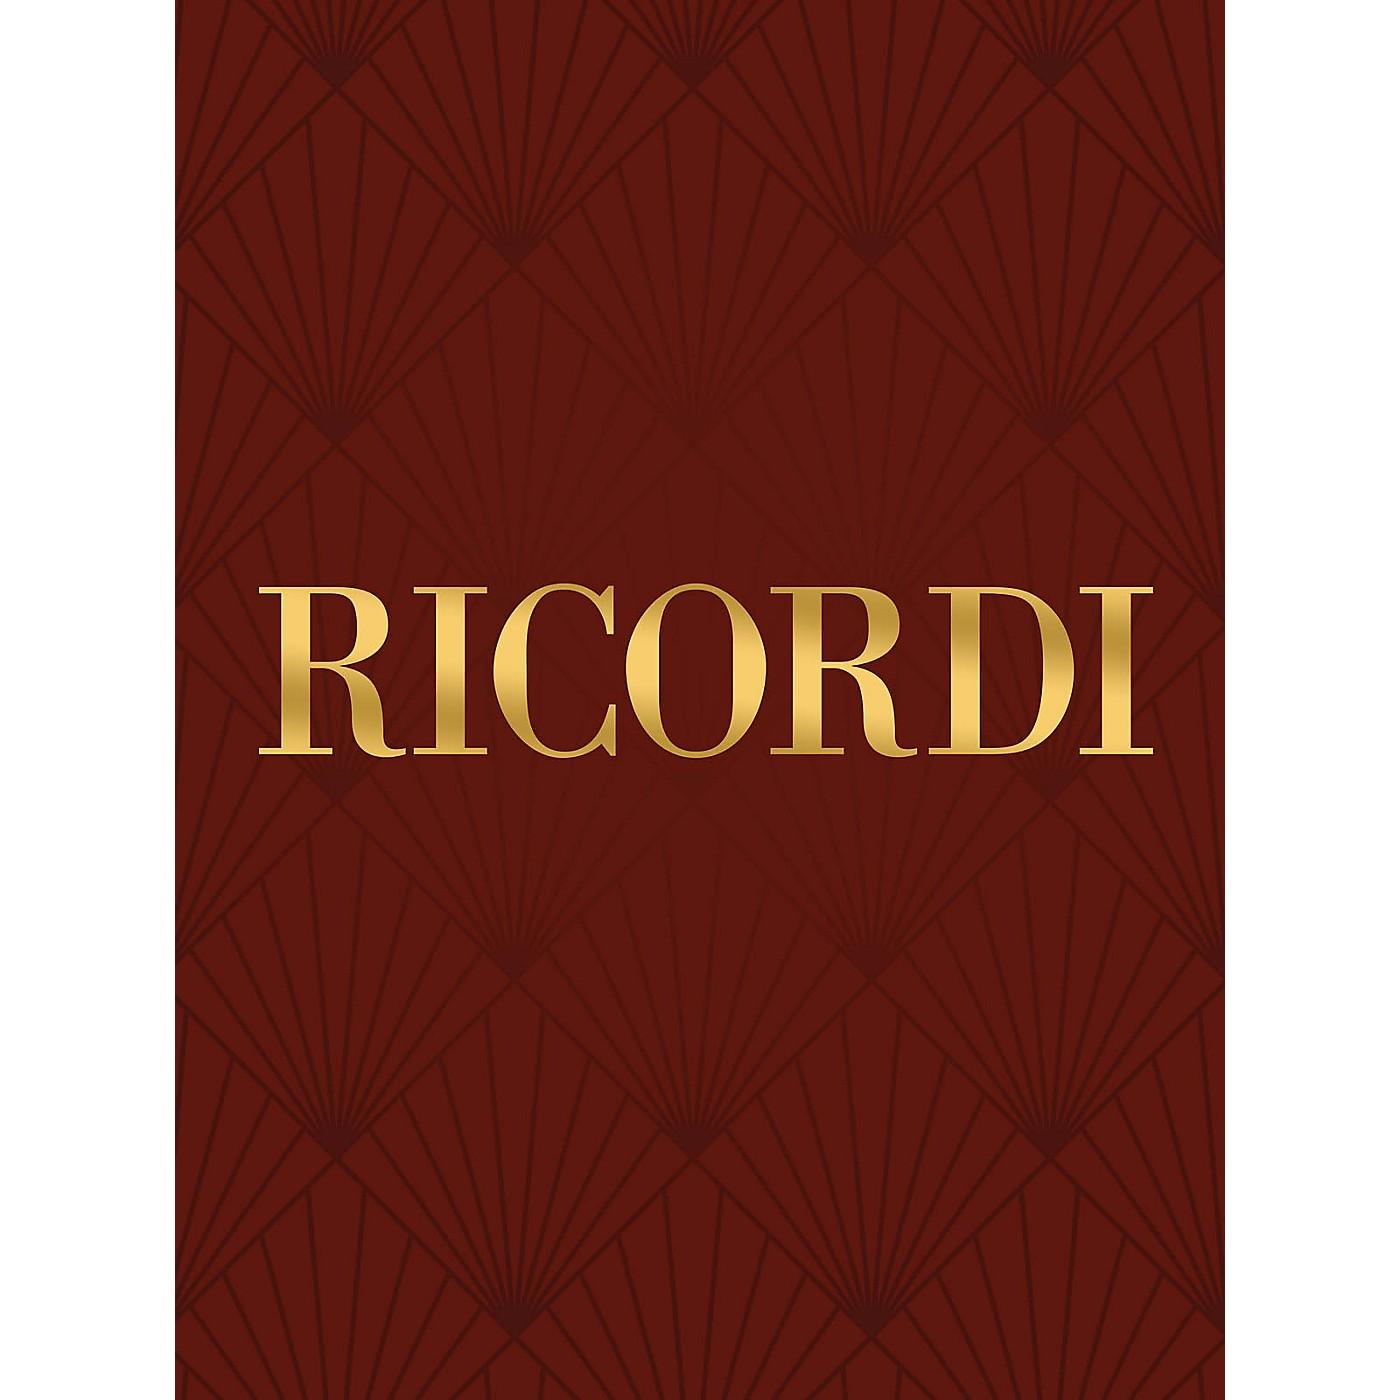 Ricordi II Bacio (High Voice) Vocal Solo Series Composed by Luigi Arditi Edited by Valzer thumbnail